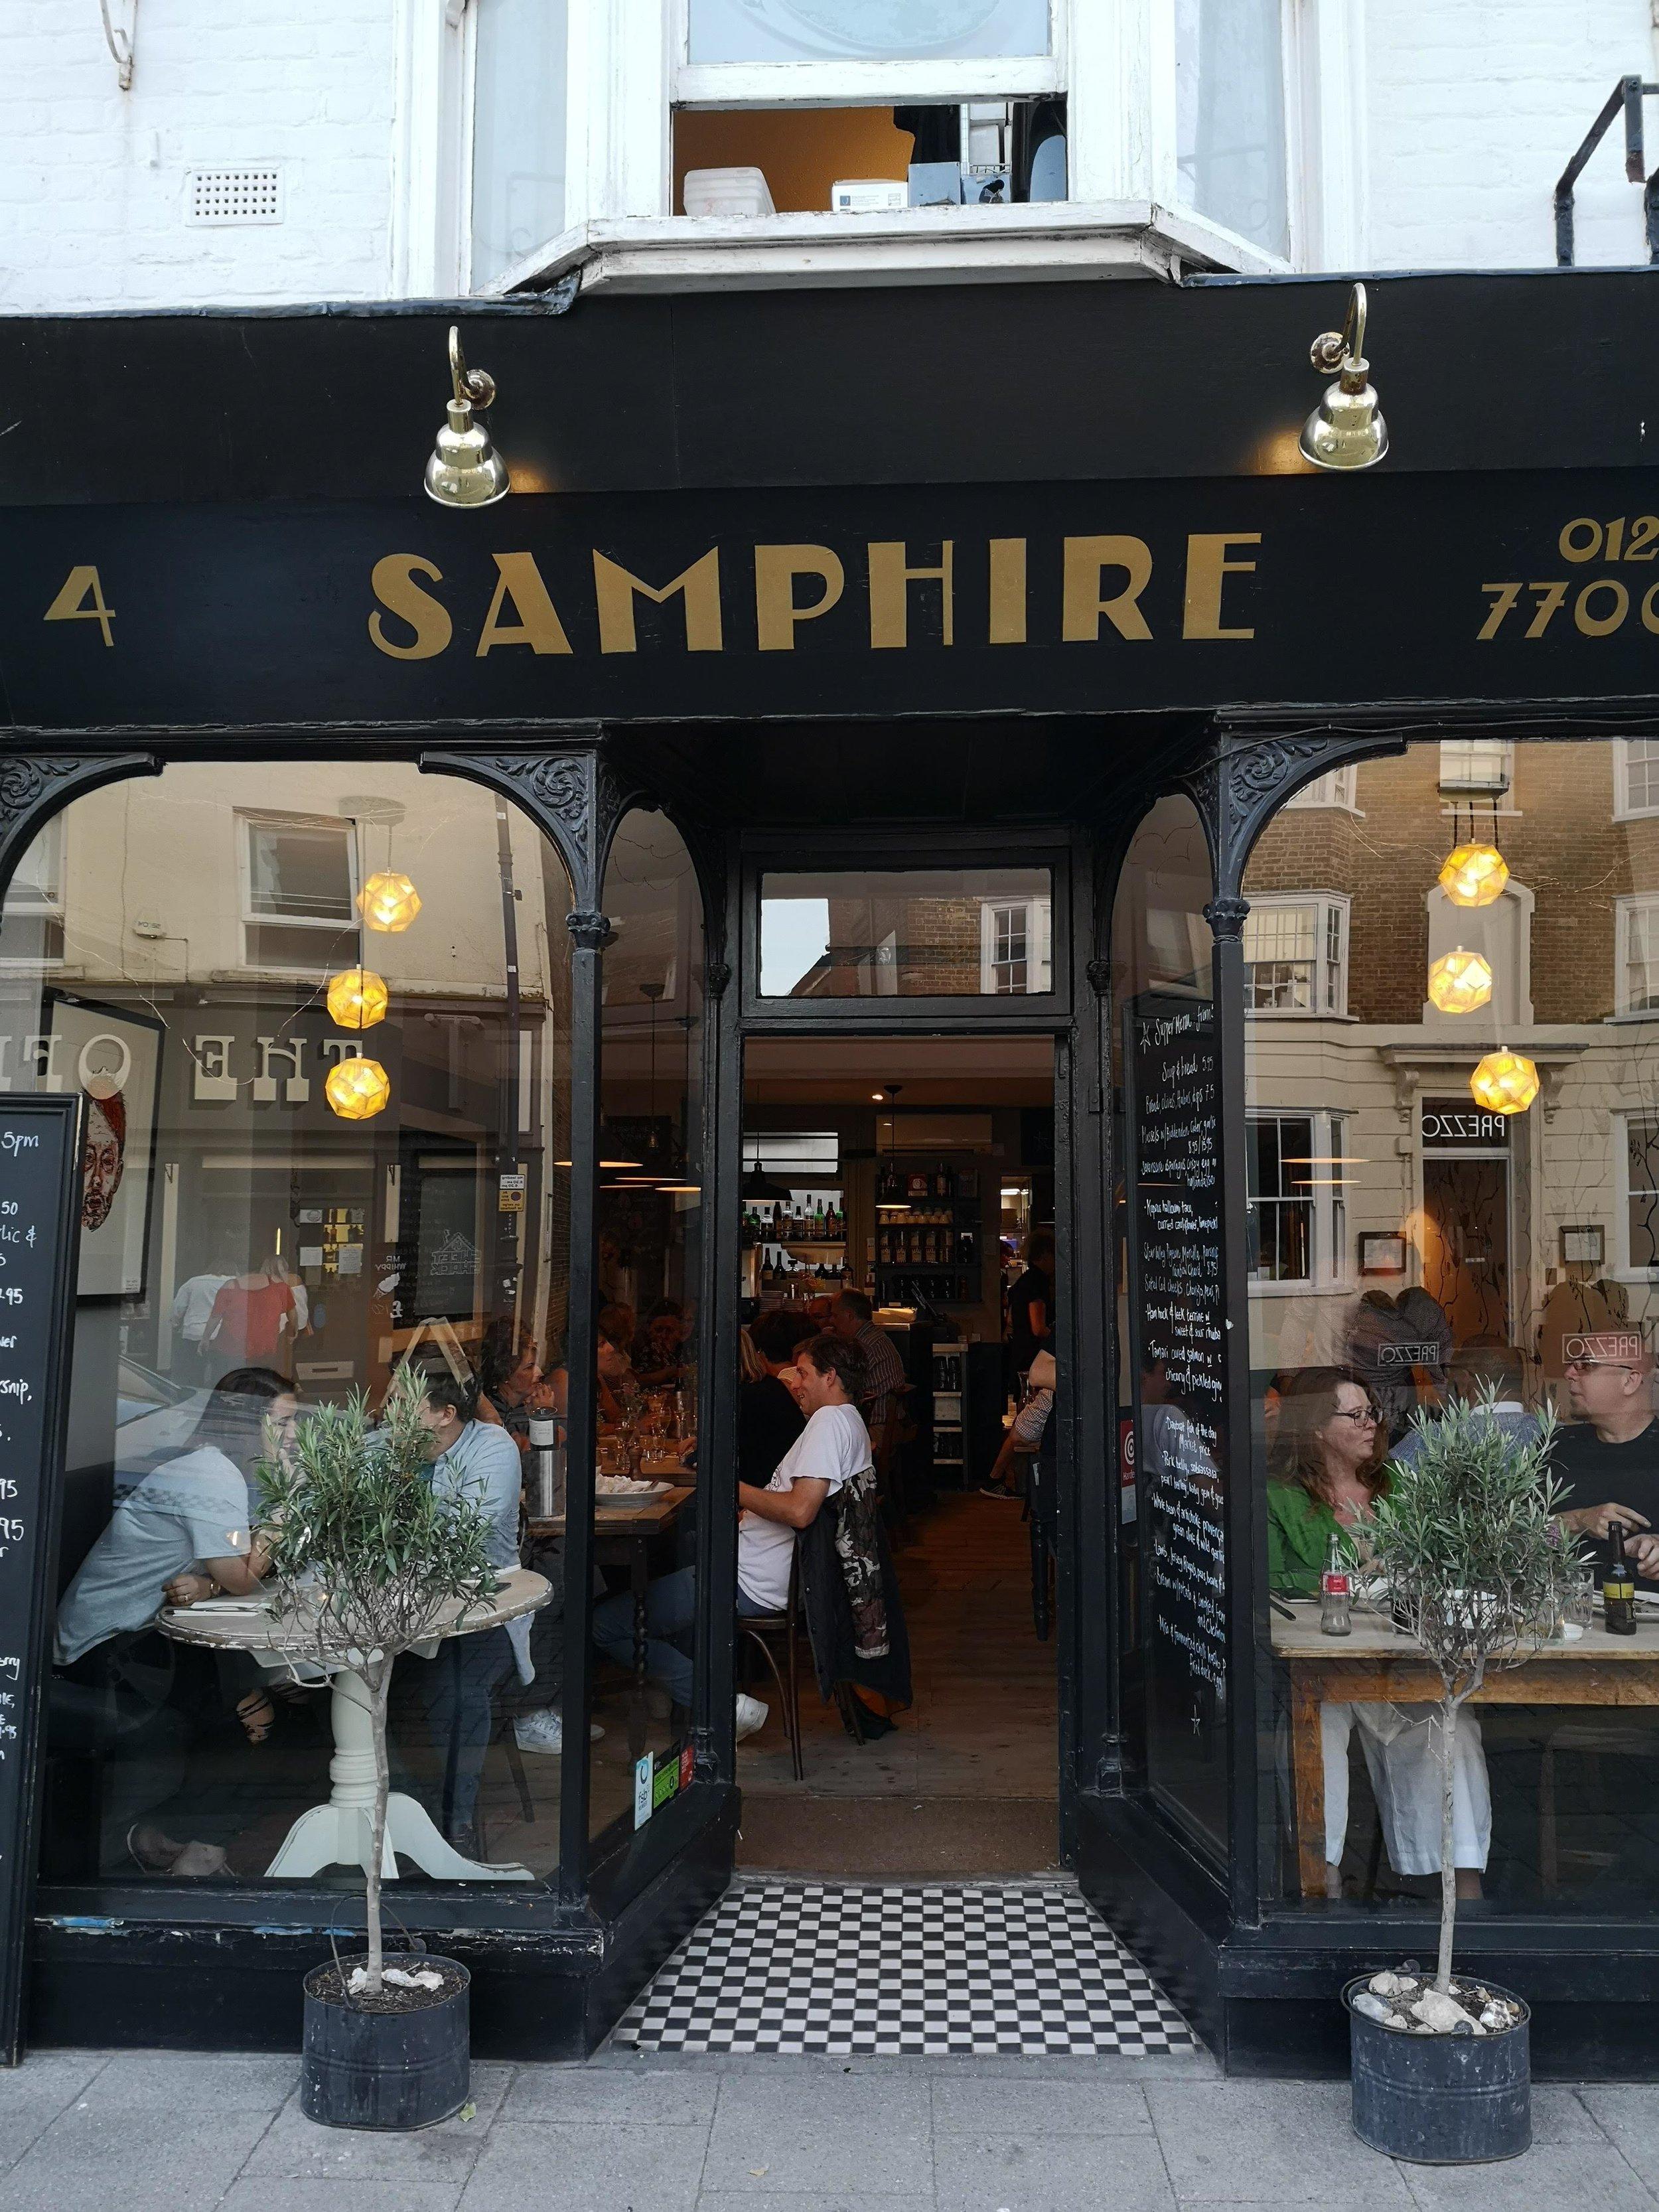 Samphire